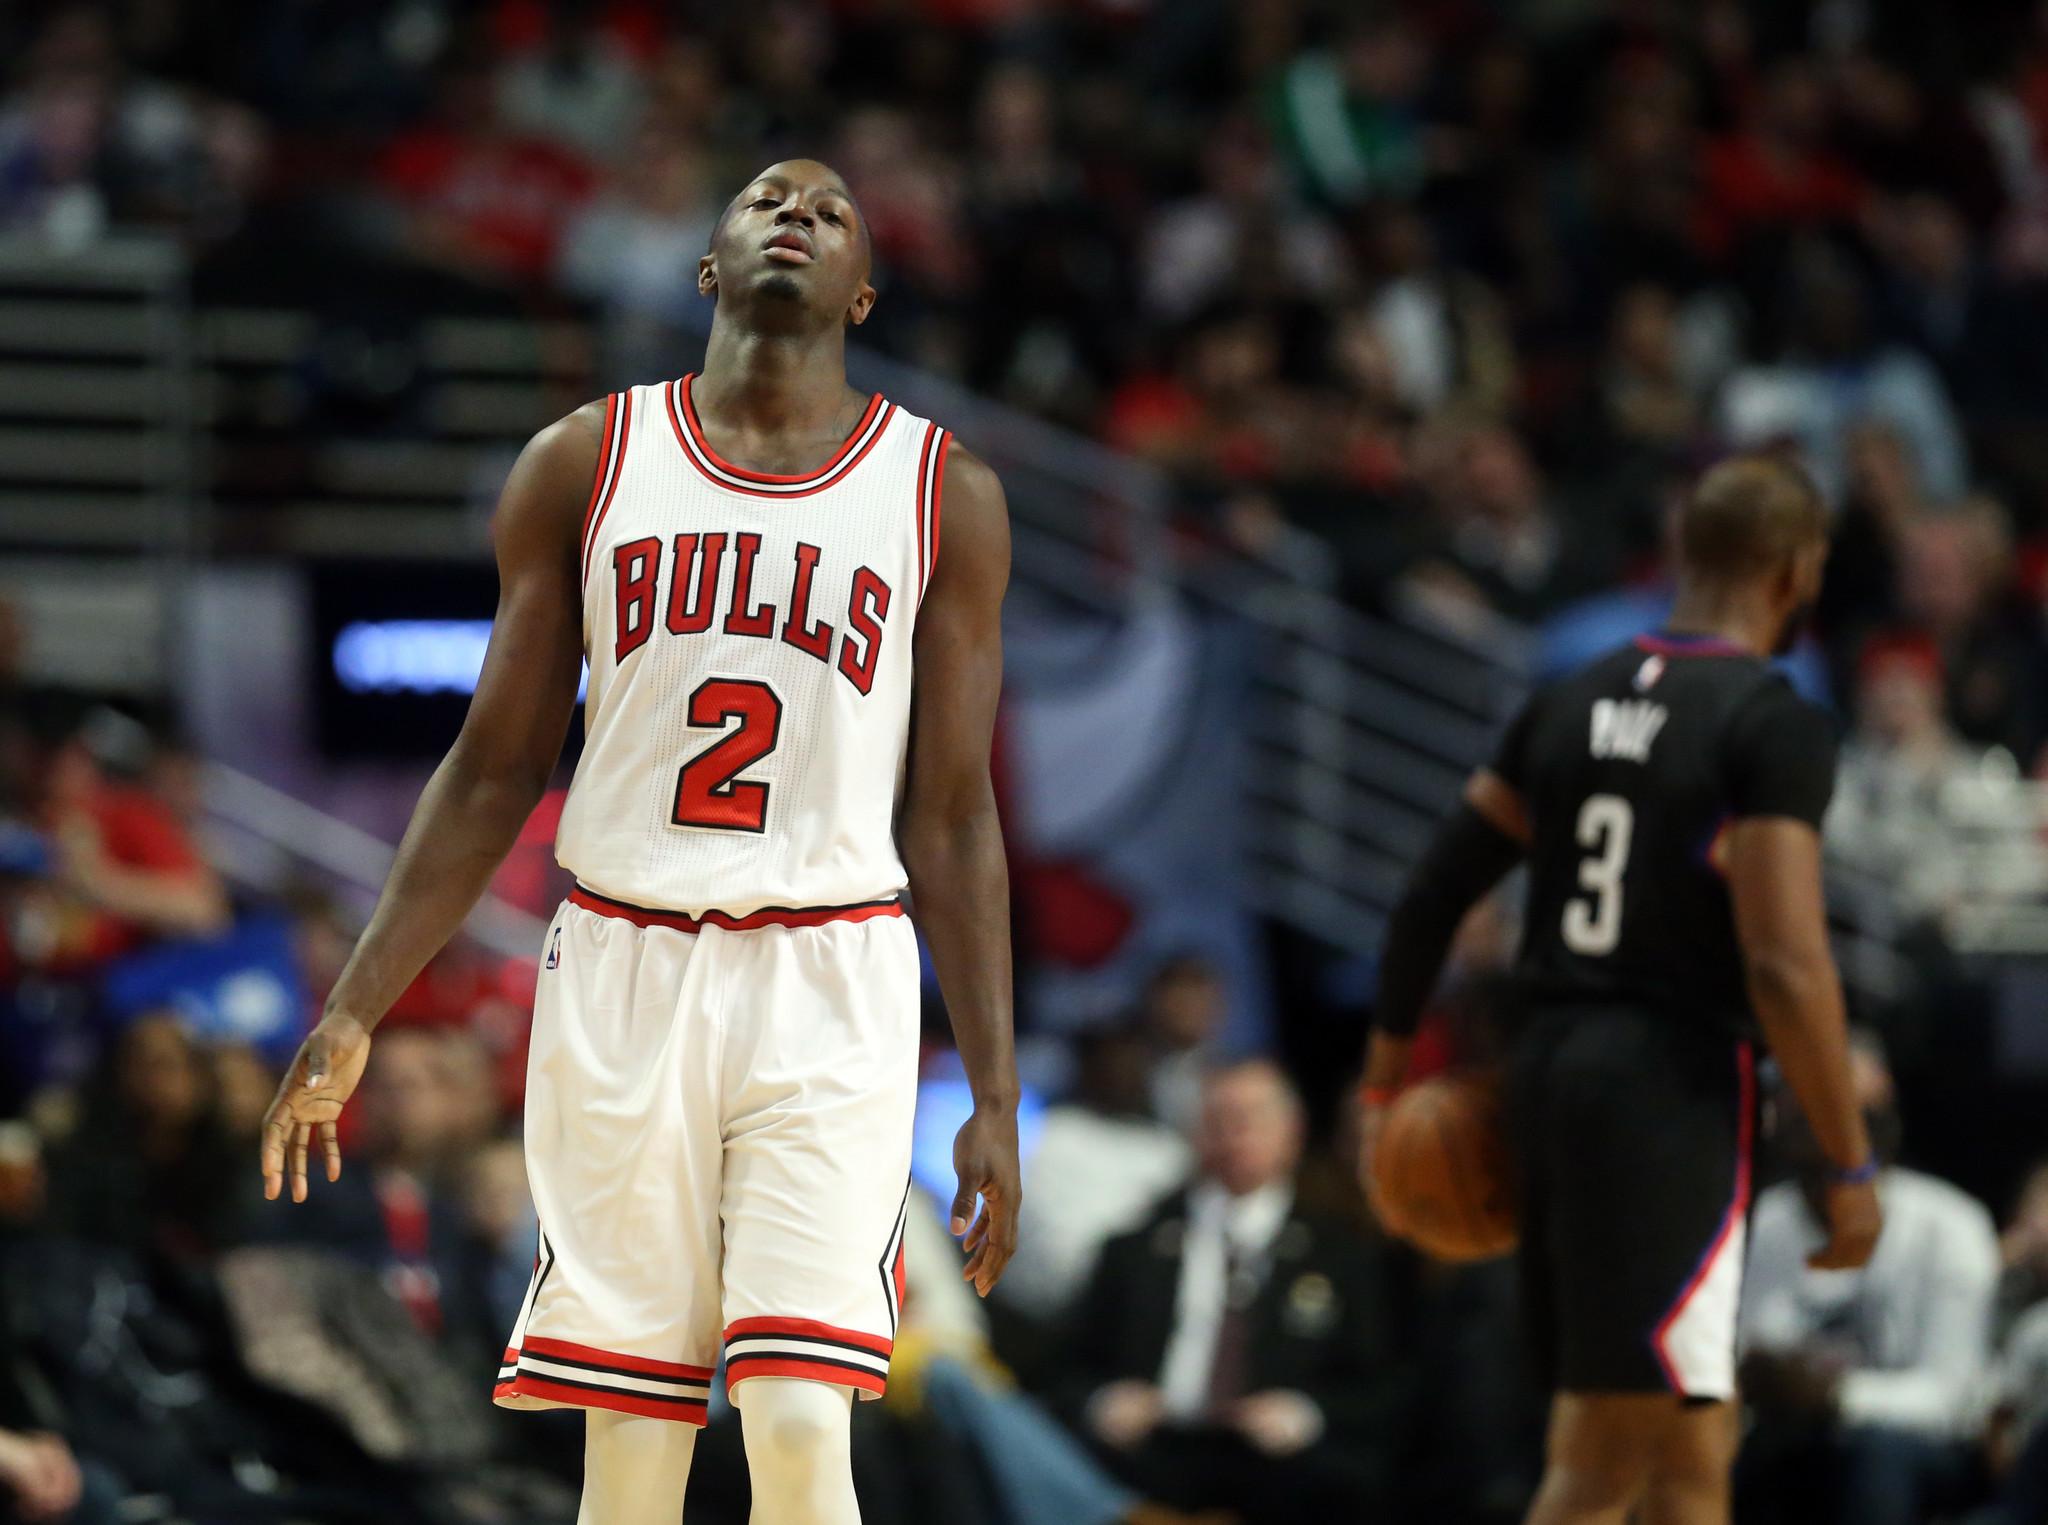 Clippers 101 Bulls 91 Chicago Tribune